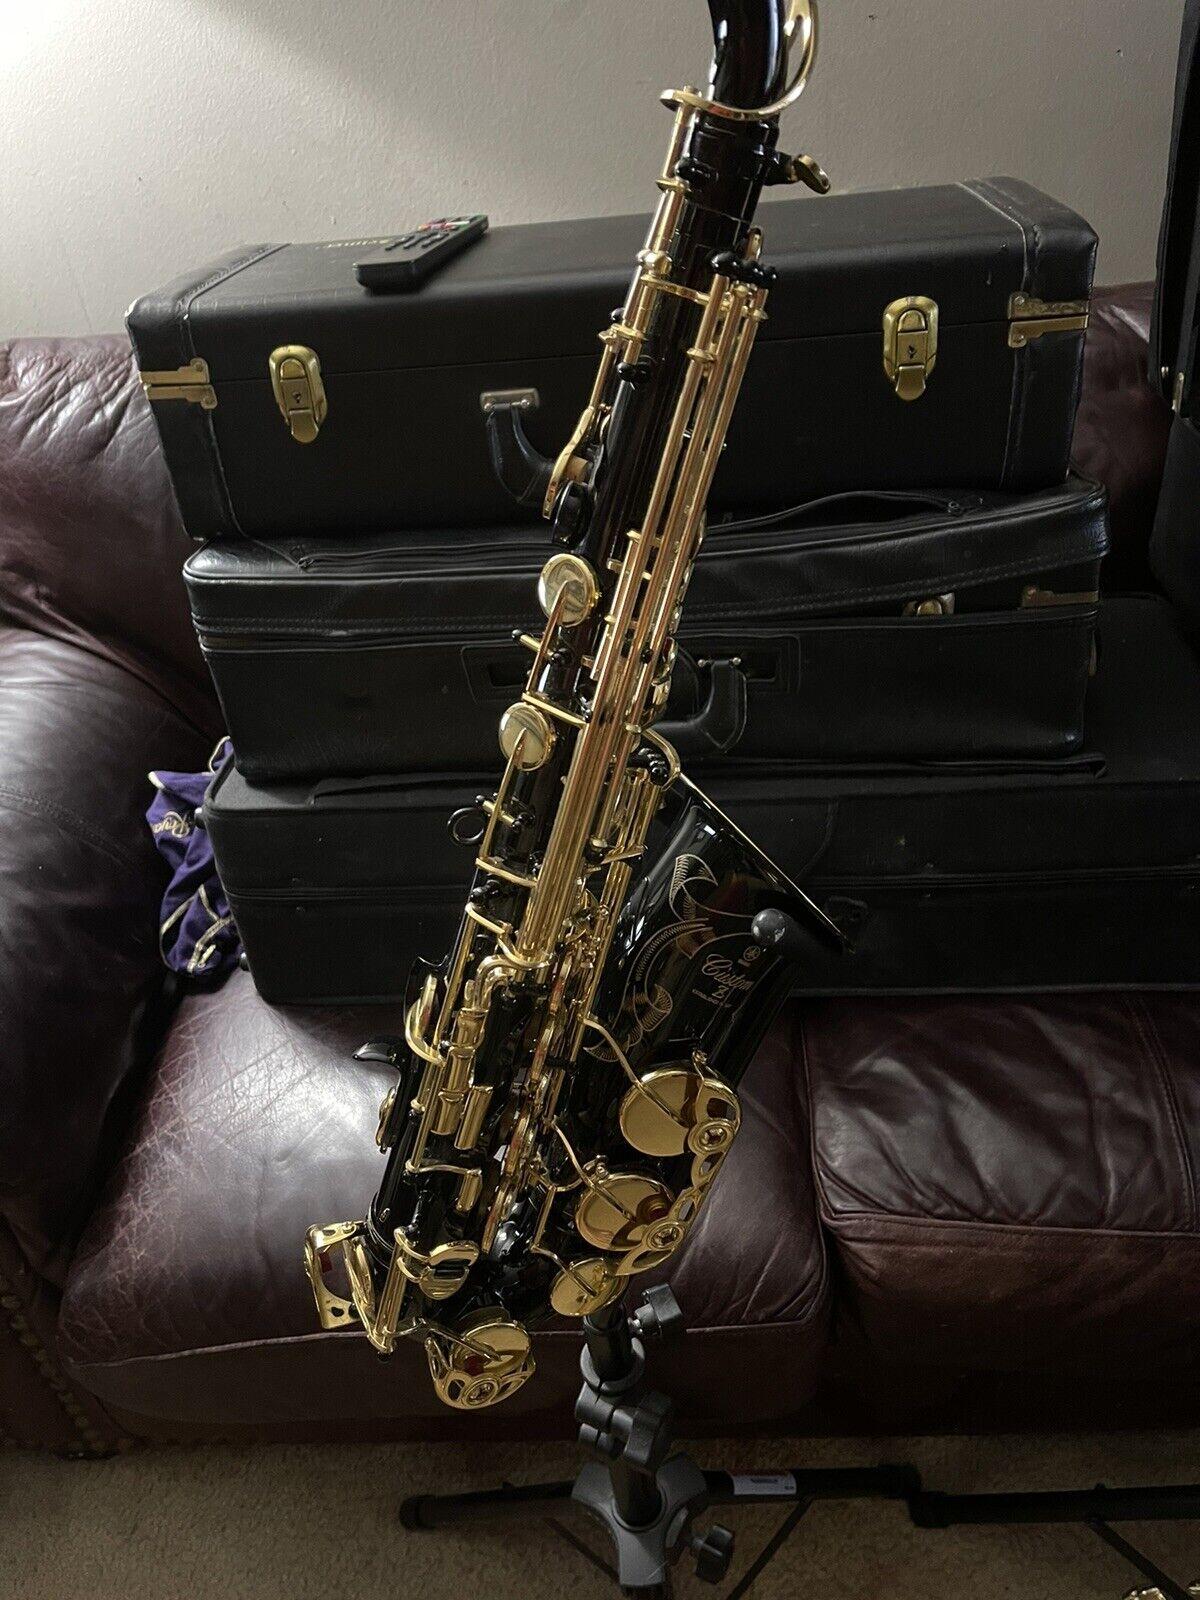 Yamaha YAS 82zIIB CUSTOM Z Alto Saxophone - $2,550.00